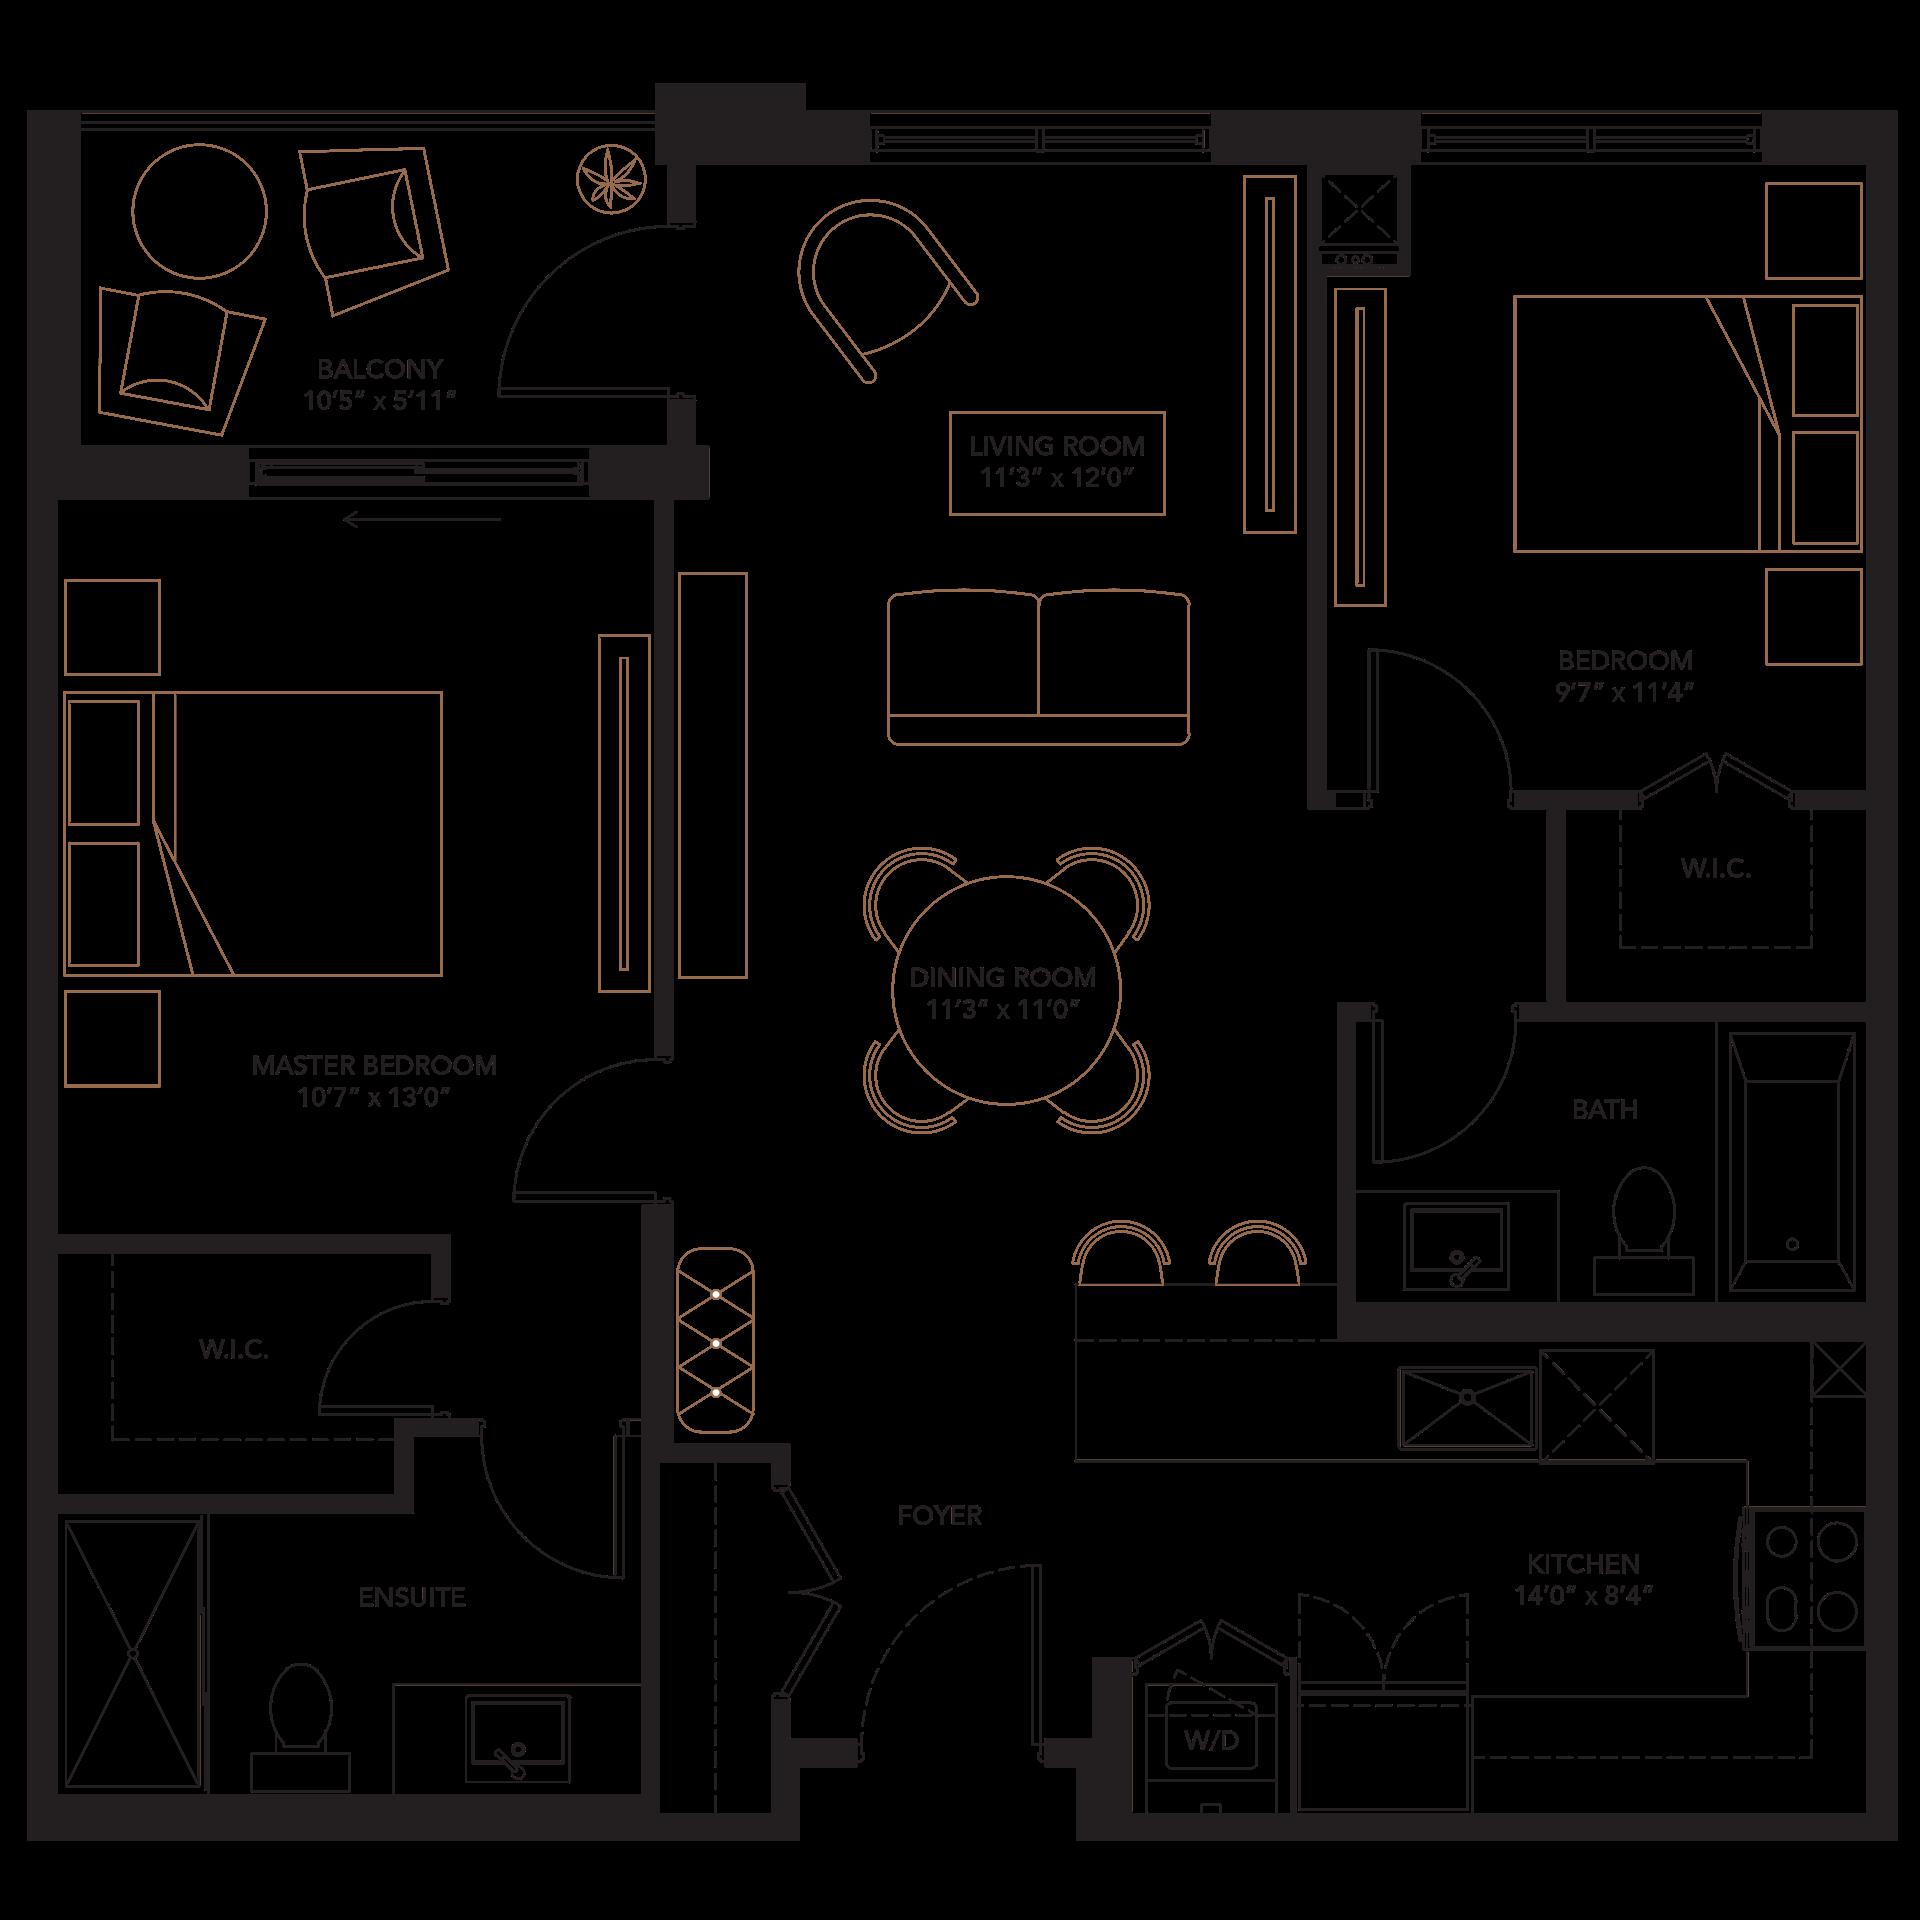 Plans monaco bedroom bathroom. Furniture clipart floor plan